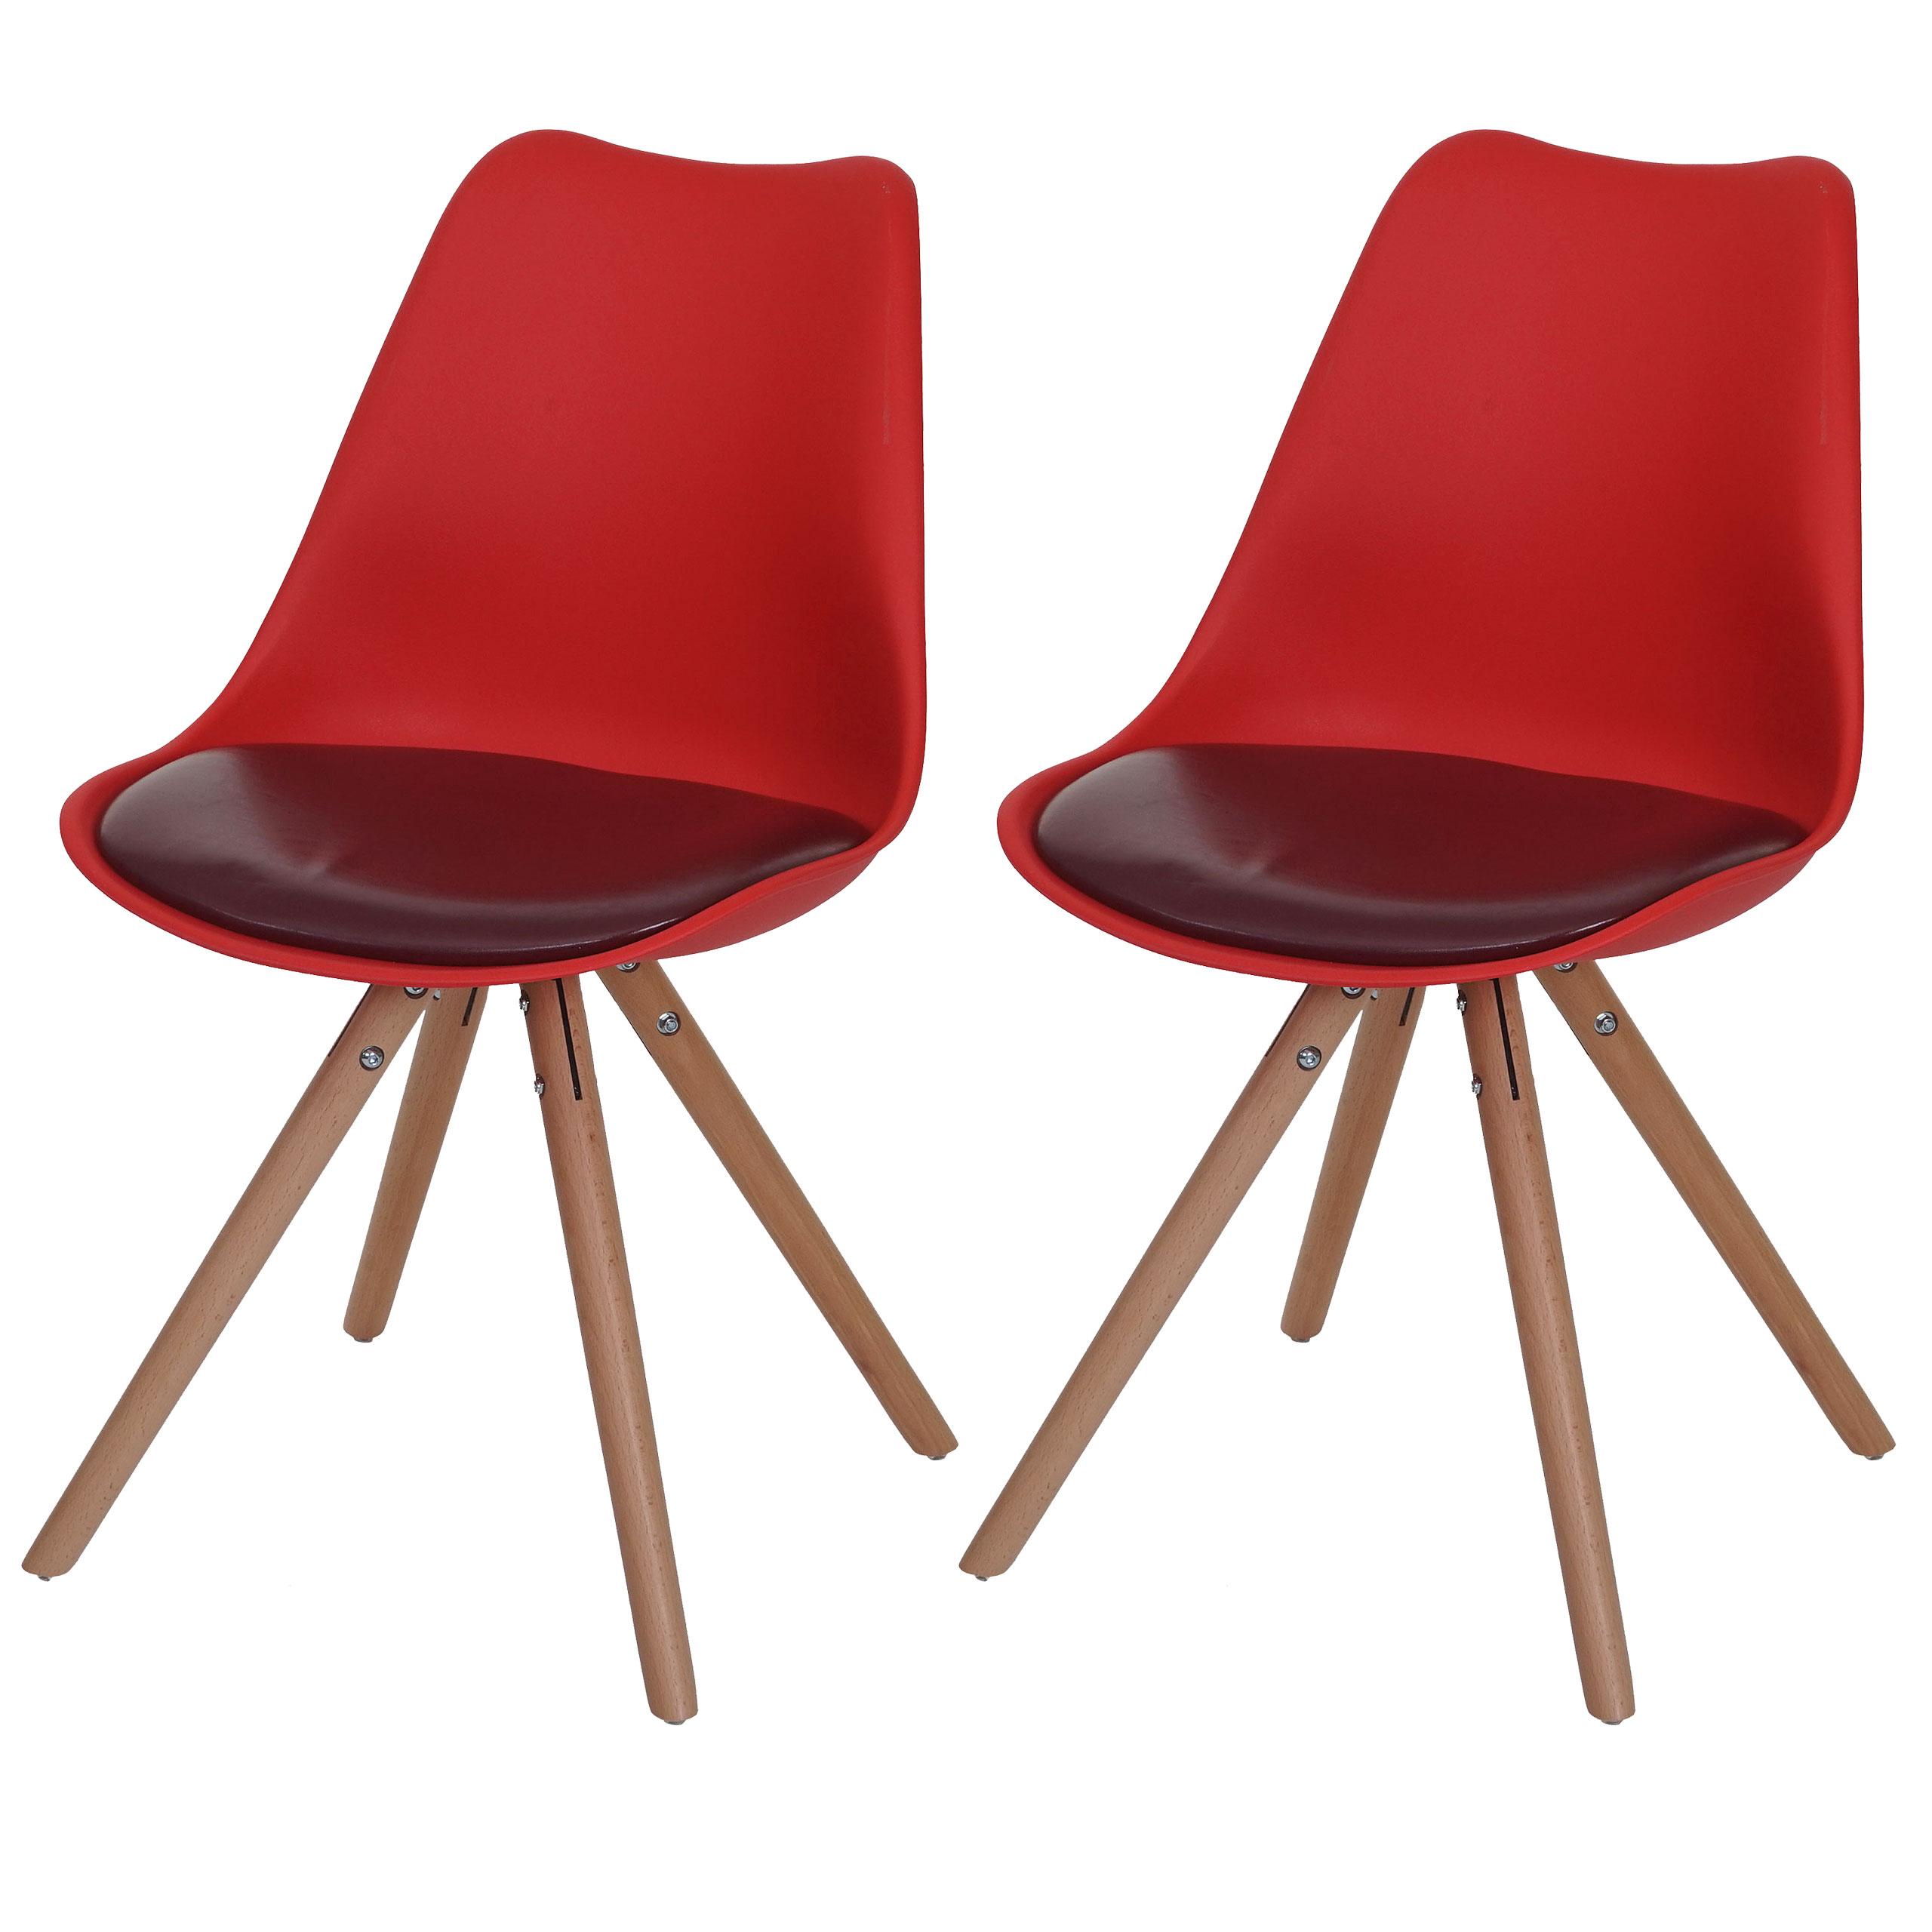 2x esszimmerstuhl malm t501 retro design rot. Black Bedroom Furniture Sets. Home Design Ideas